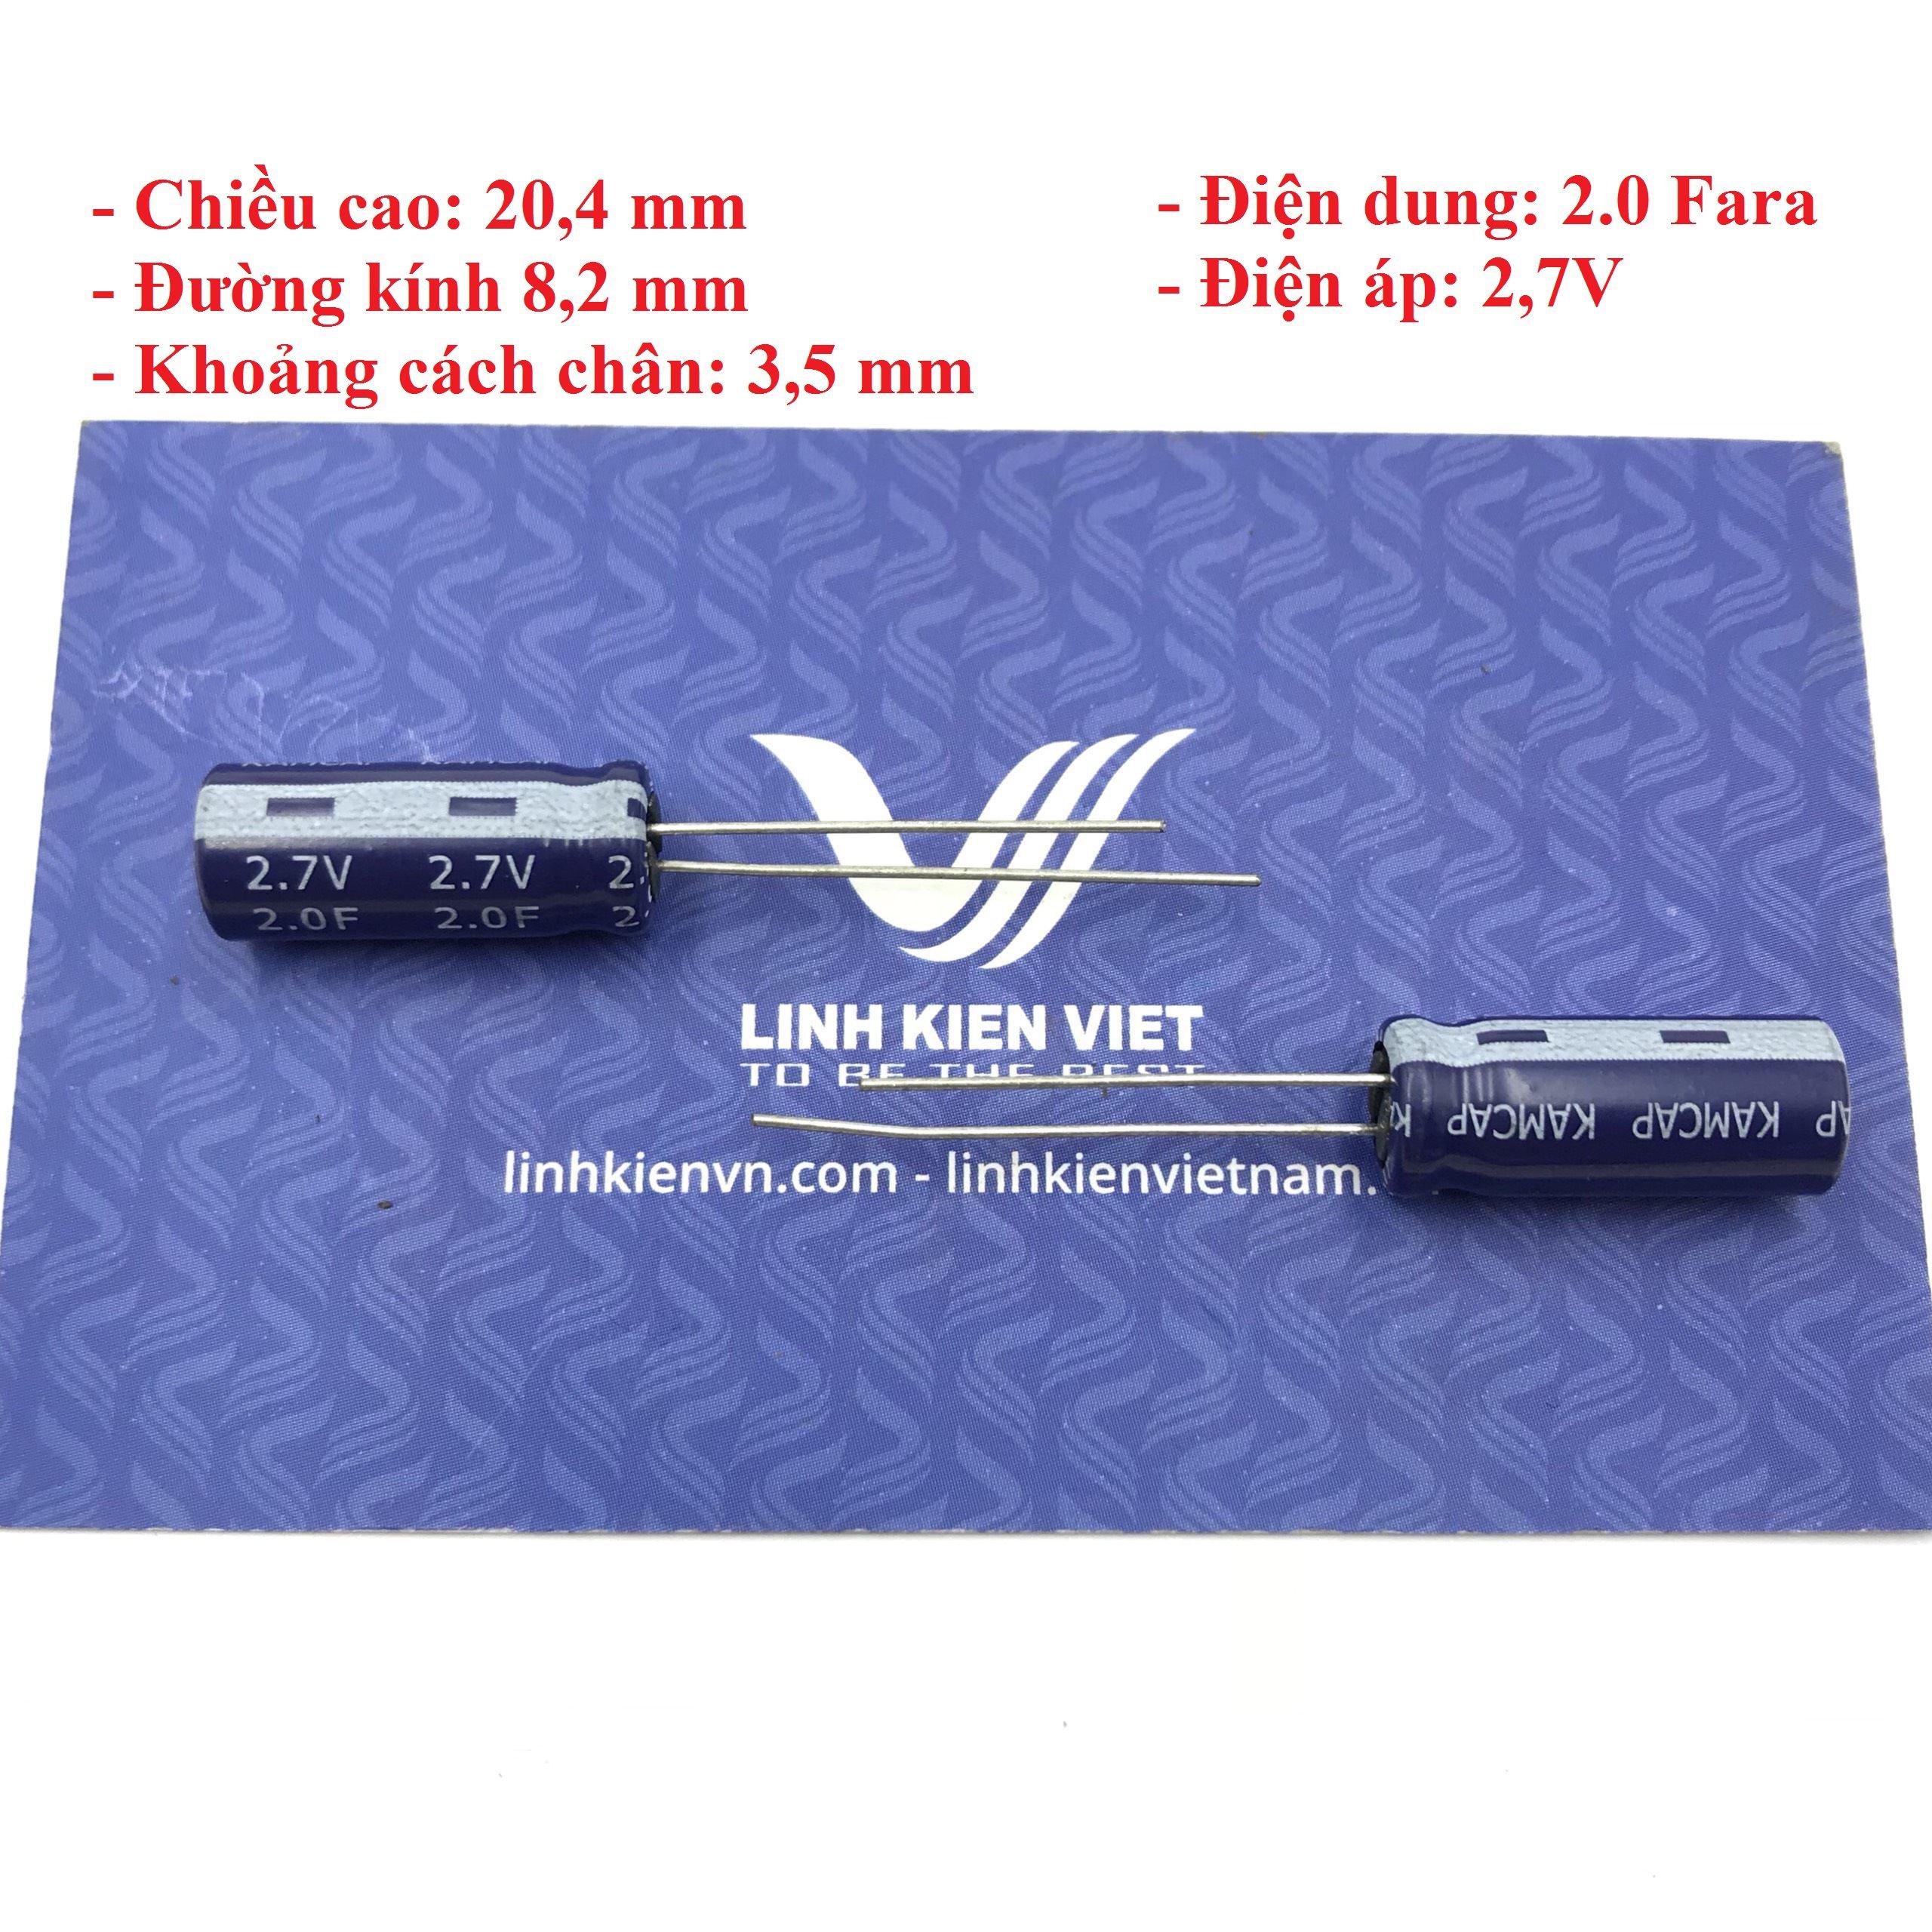 Siêu tụ điện 2F 2.7V - X4H8